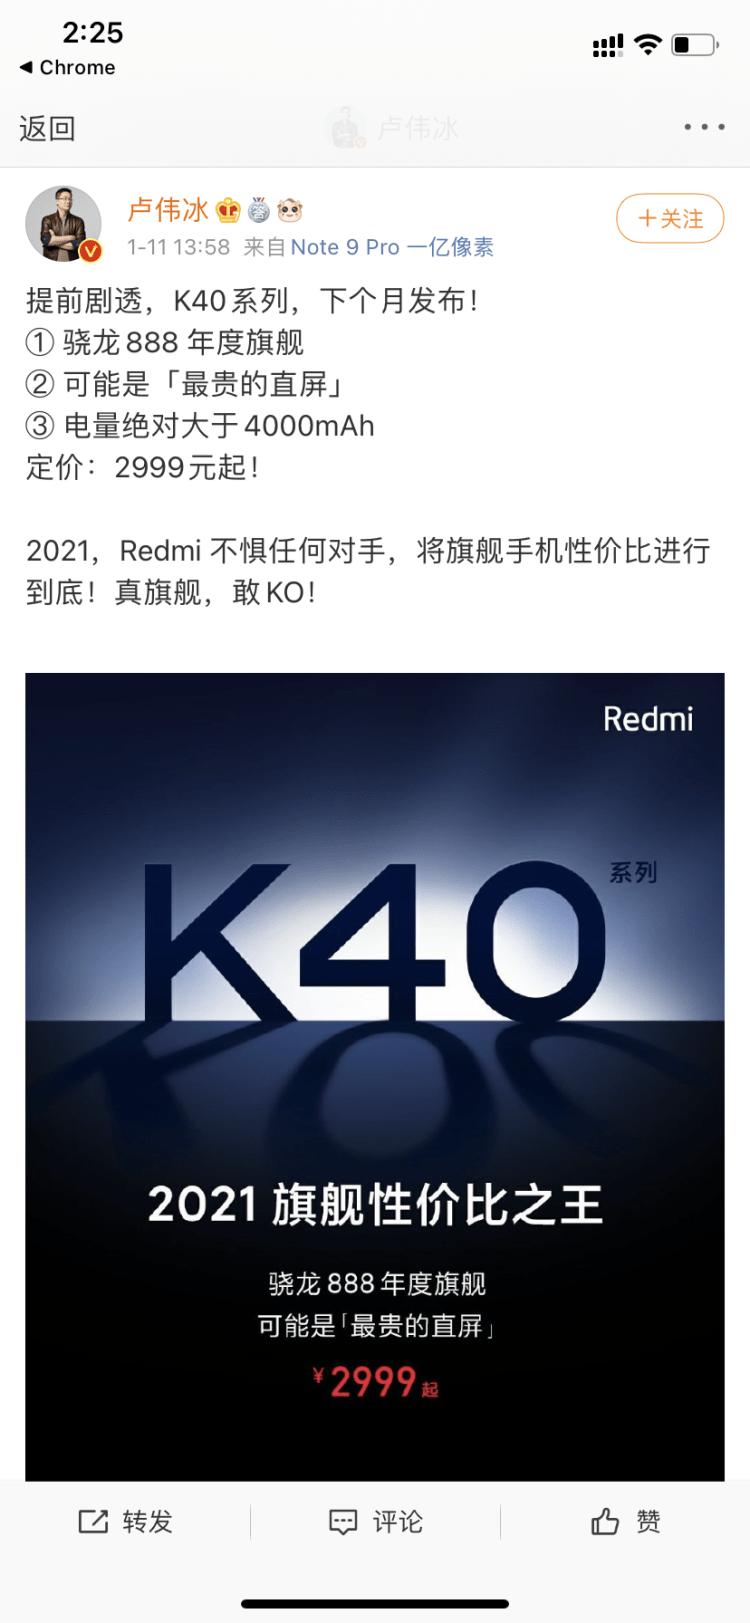 【PW早报】iQOO 7搭载骁龙888,3798元起售